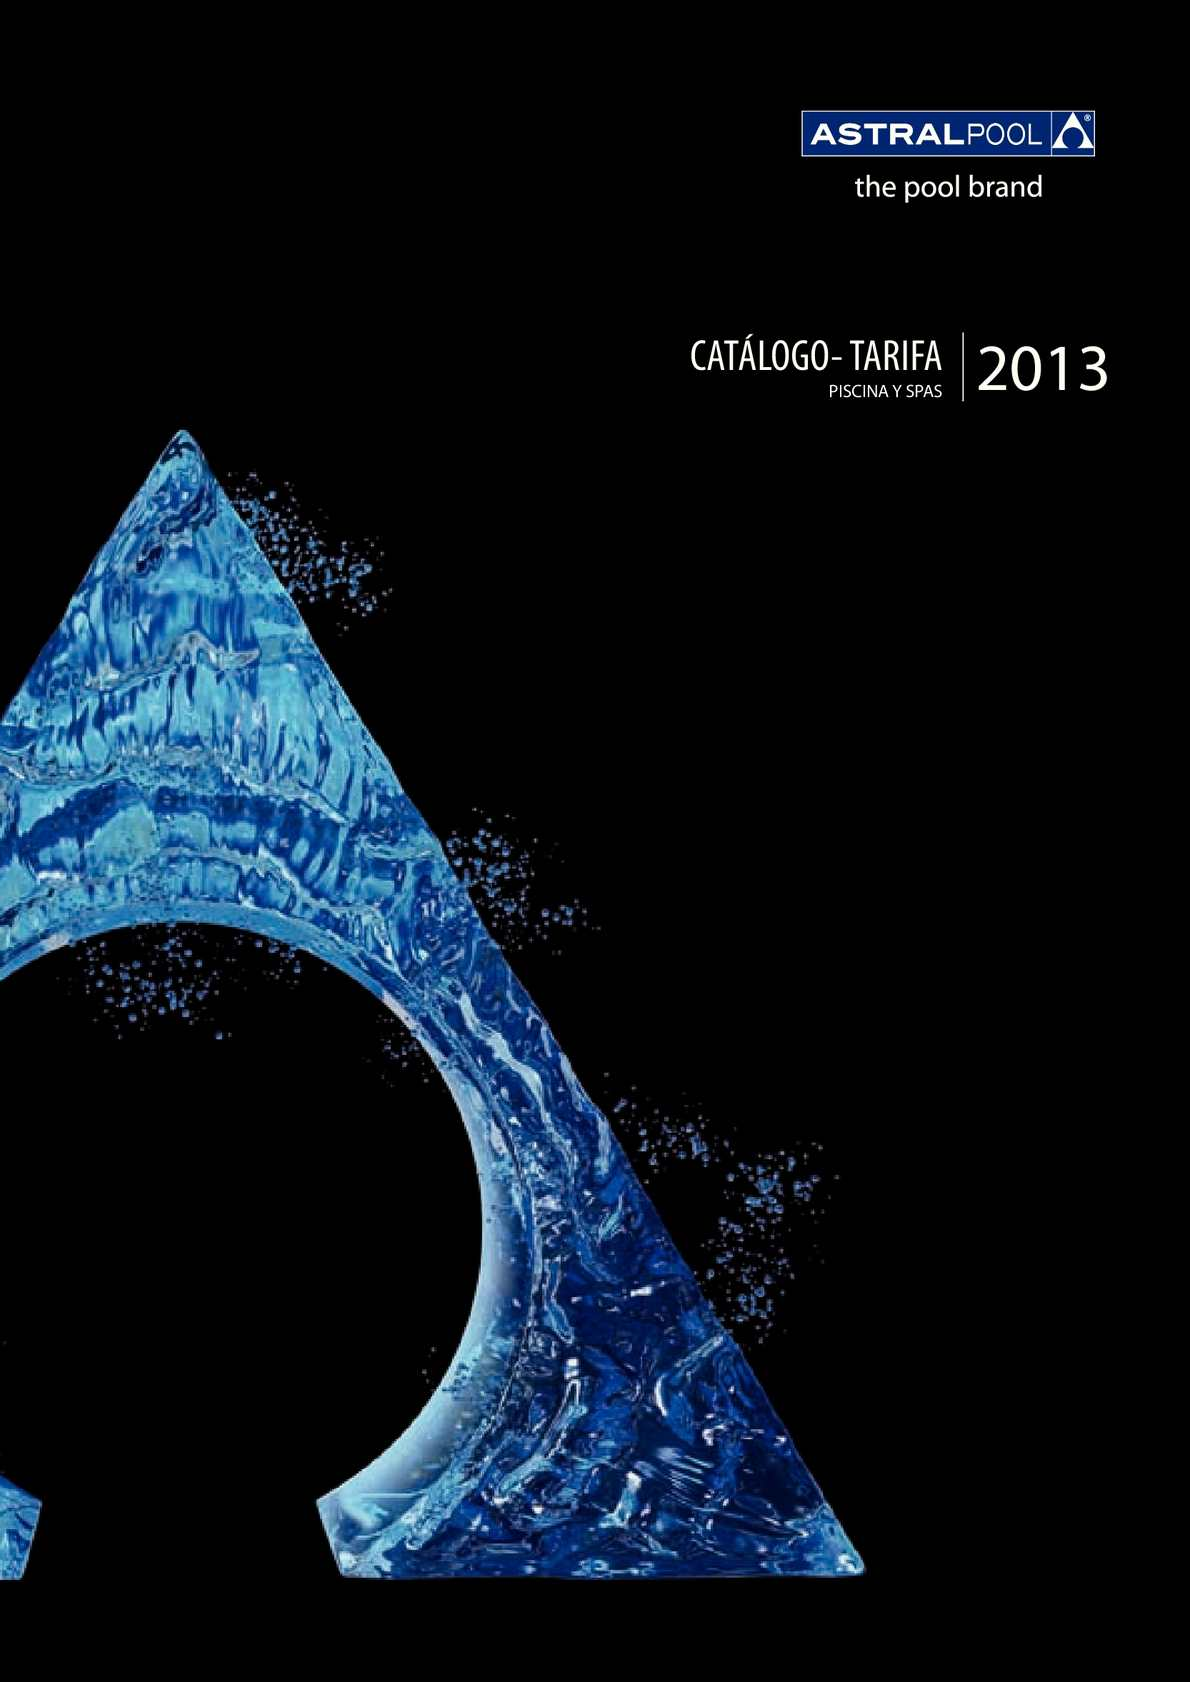 Calamo  Catalogo Tarifa Astralpool 2013